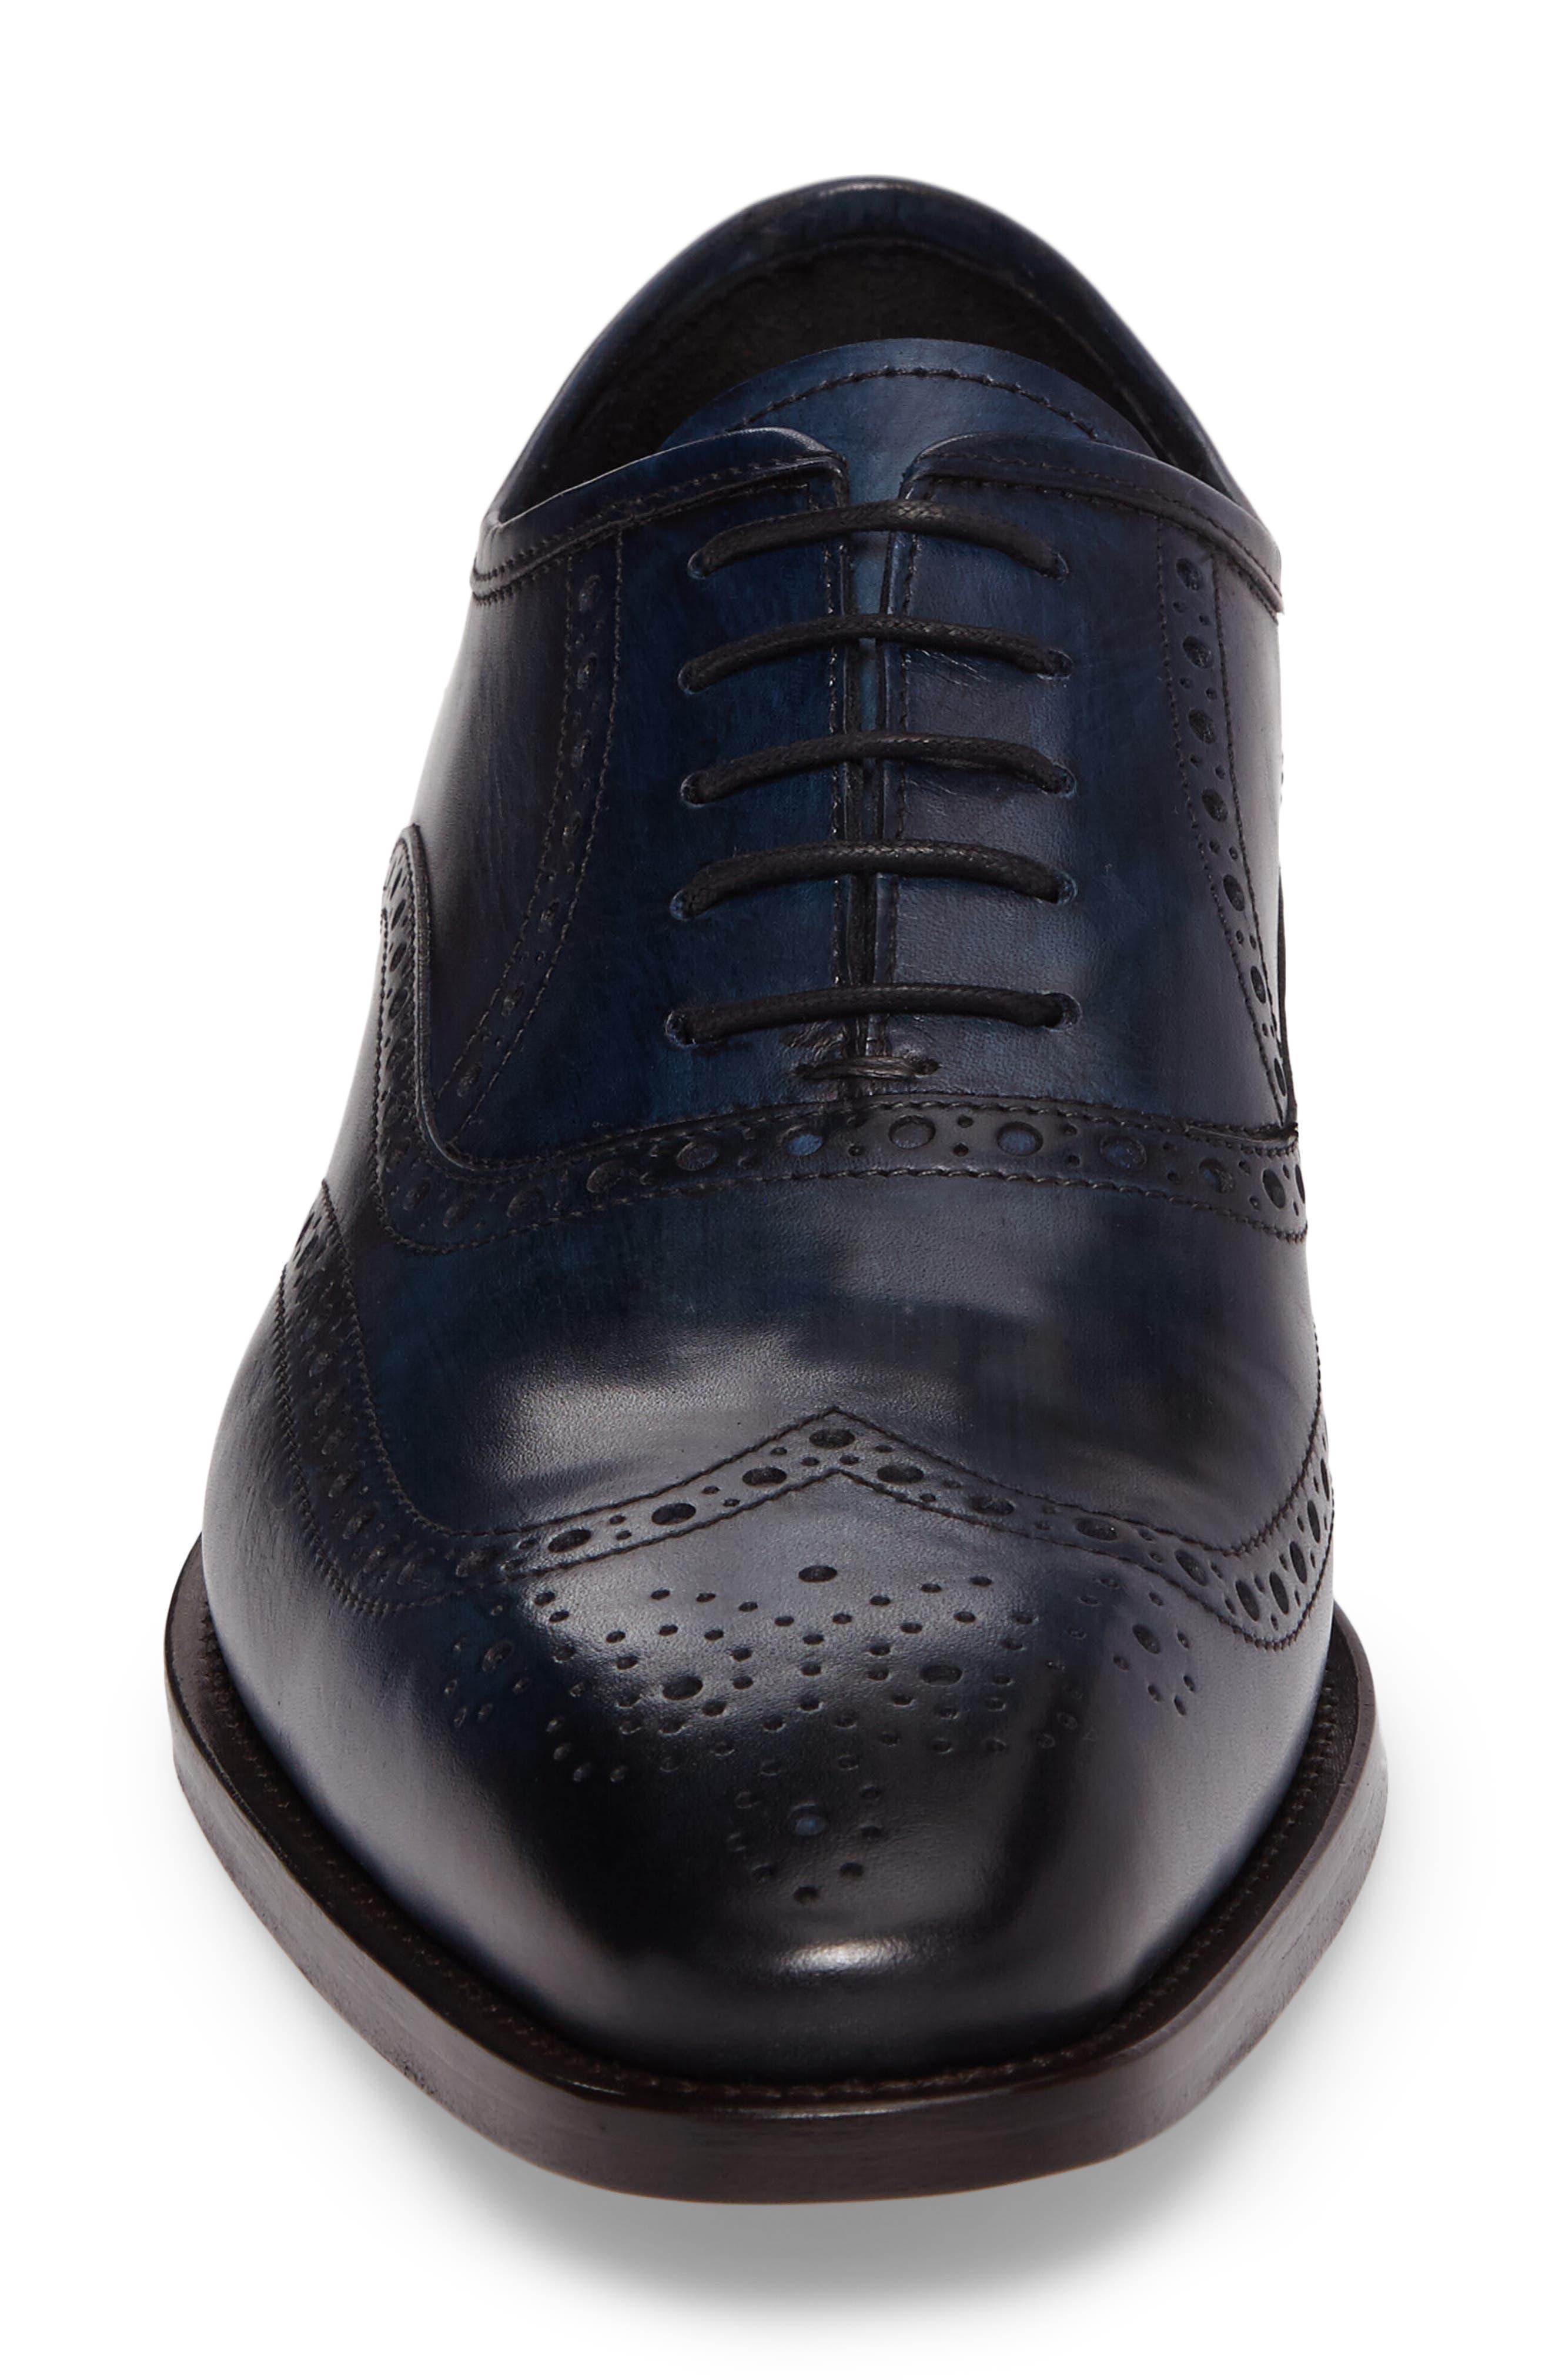 Sabina Medallion Toe Oxford,                             Alternate thumbnail 4, color,                             Ocean Blue Leather